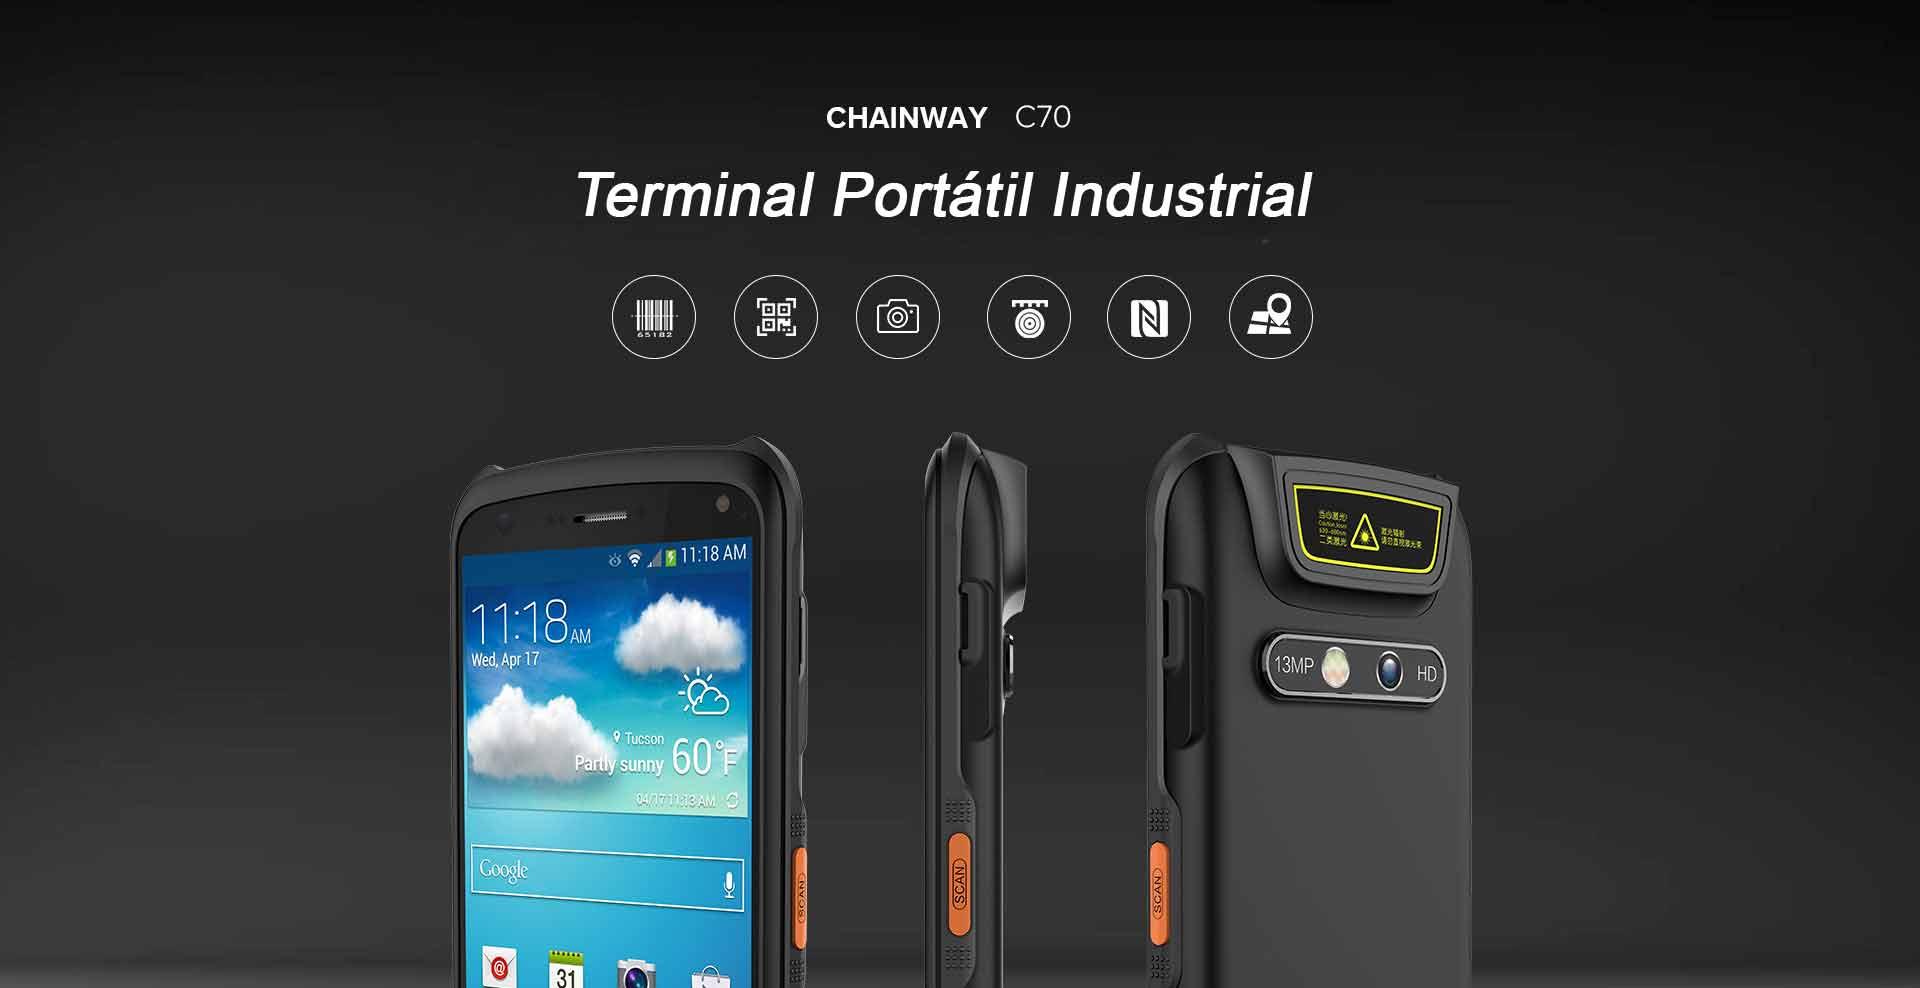 TERMINAL PORTATIL INDUSTRIAL  C70 CHAINWAY CON TERMOMETRO